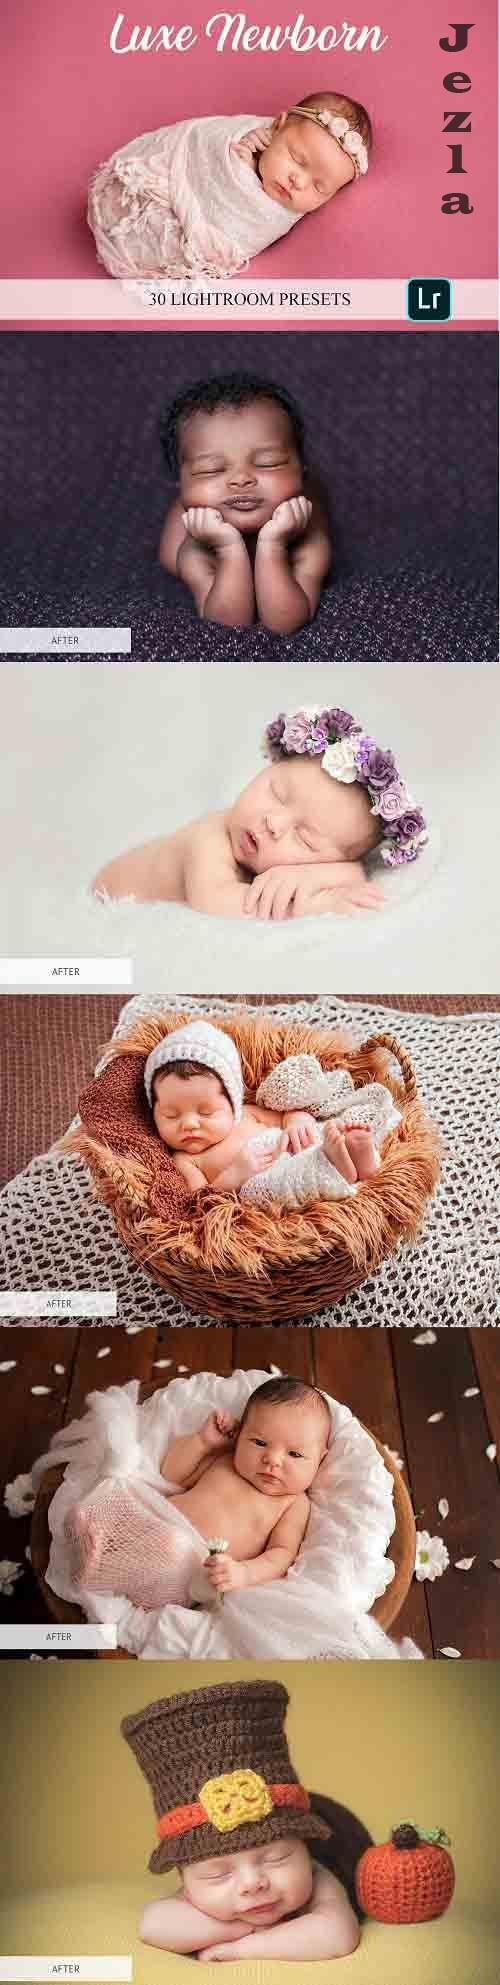 LRM Presets - Luxe Newborn 4820937